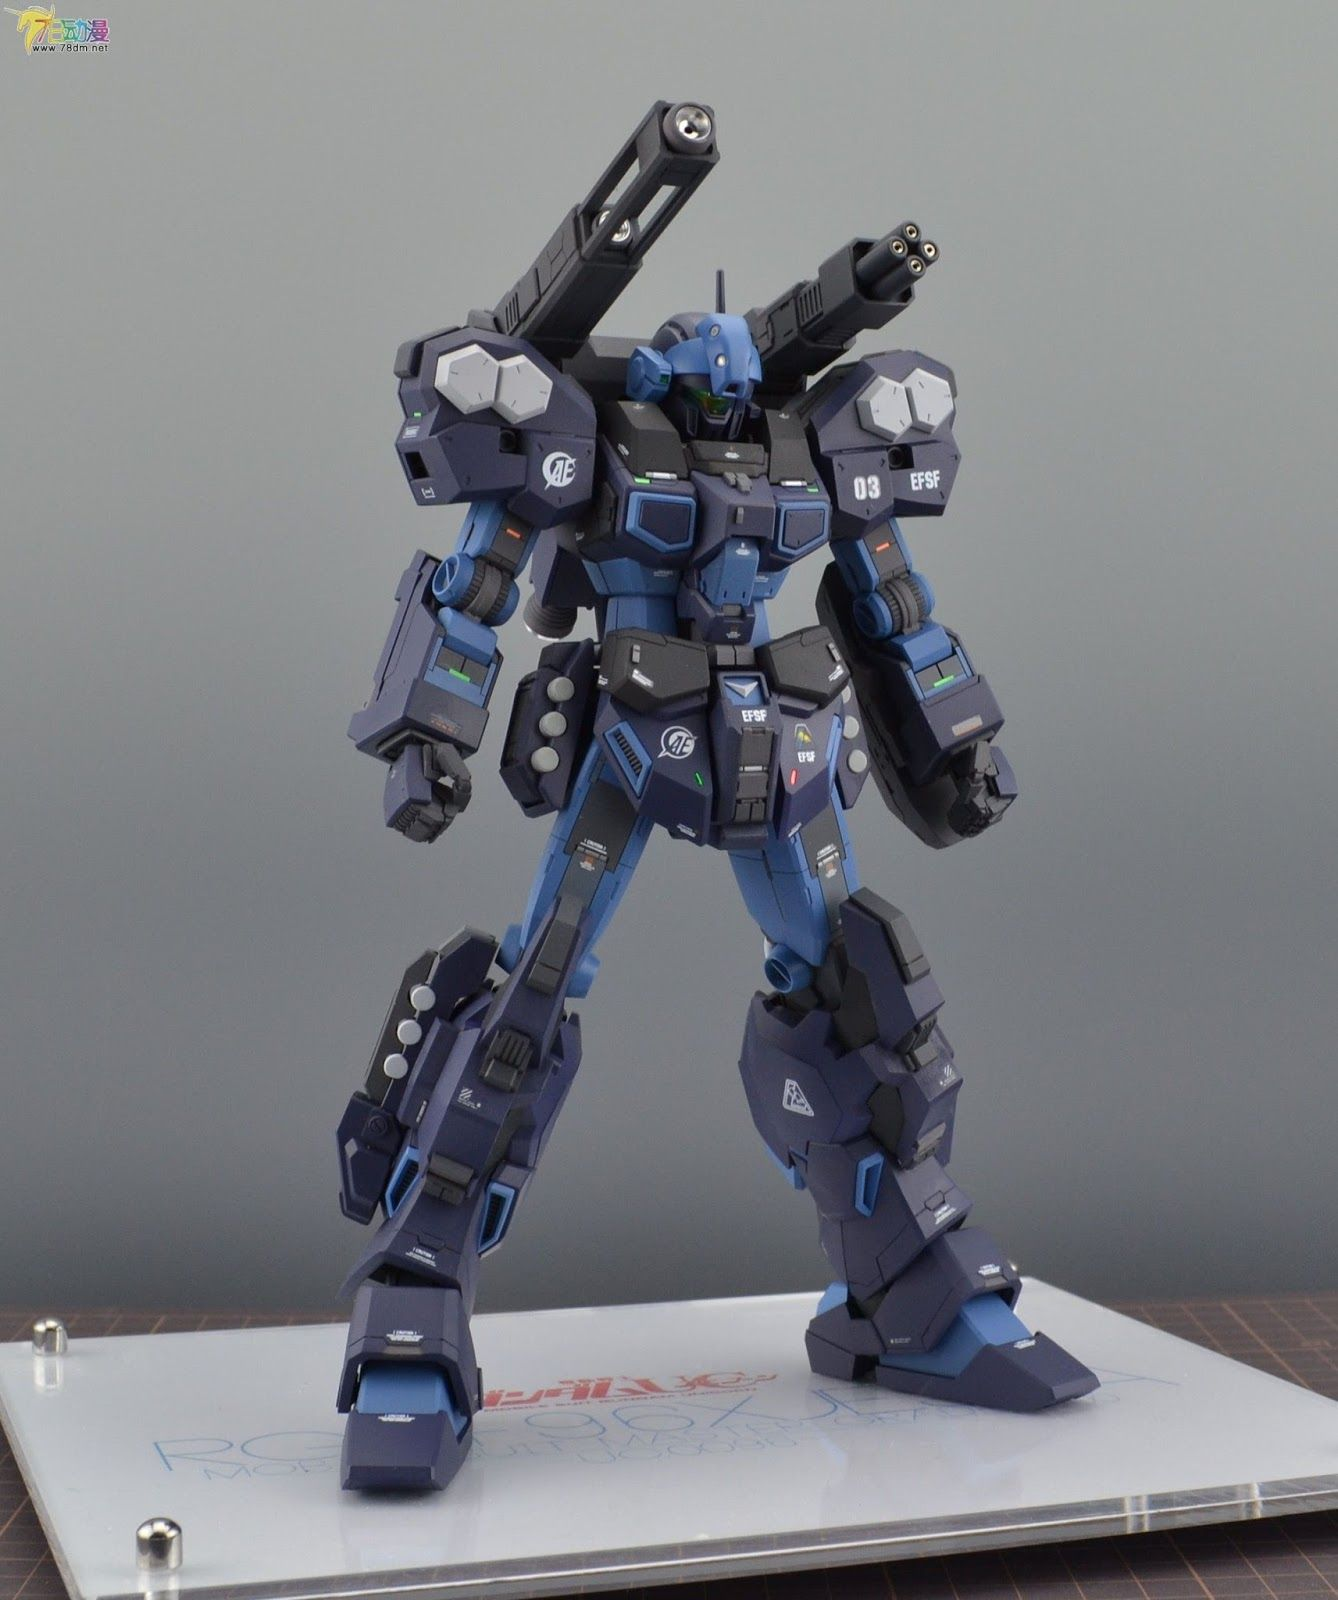 Gundam Guy Jesta Cannon Customized Build Pinterest Bandai 1 144 Hg Asw G 47 Vual